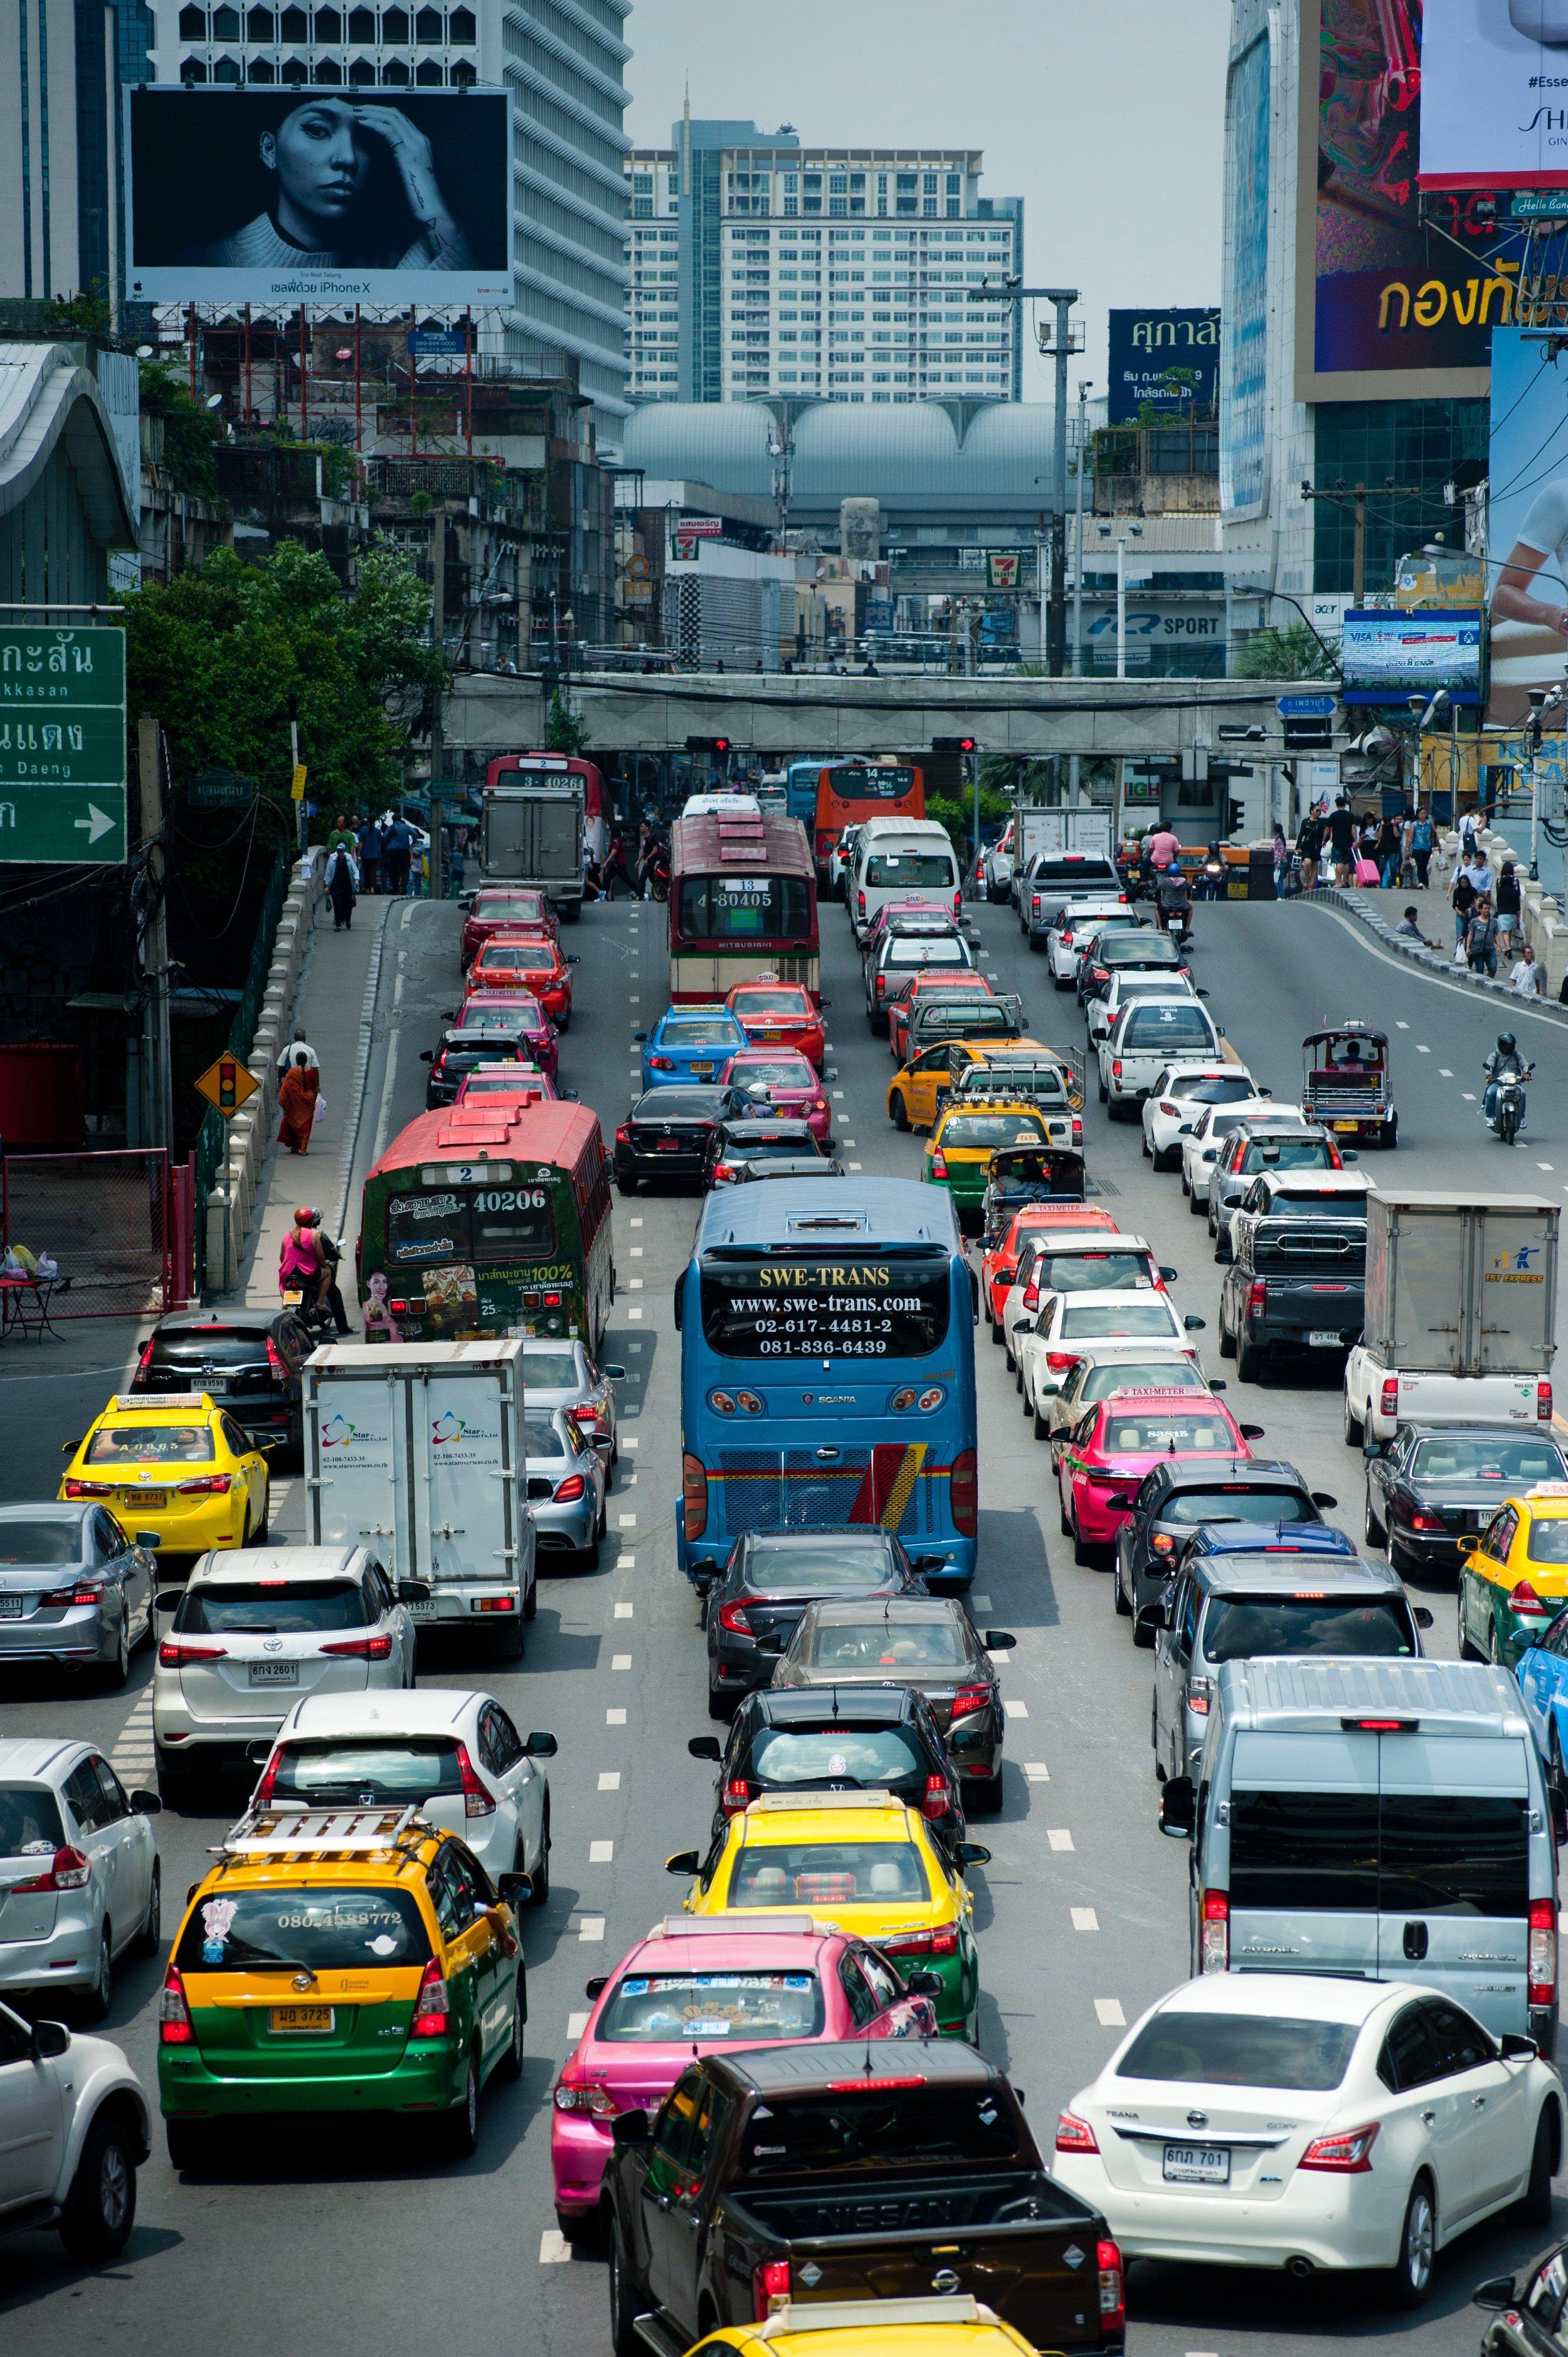 action-bangkok-business-1031698 (1).jpg